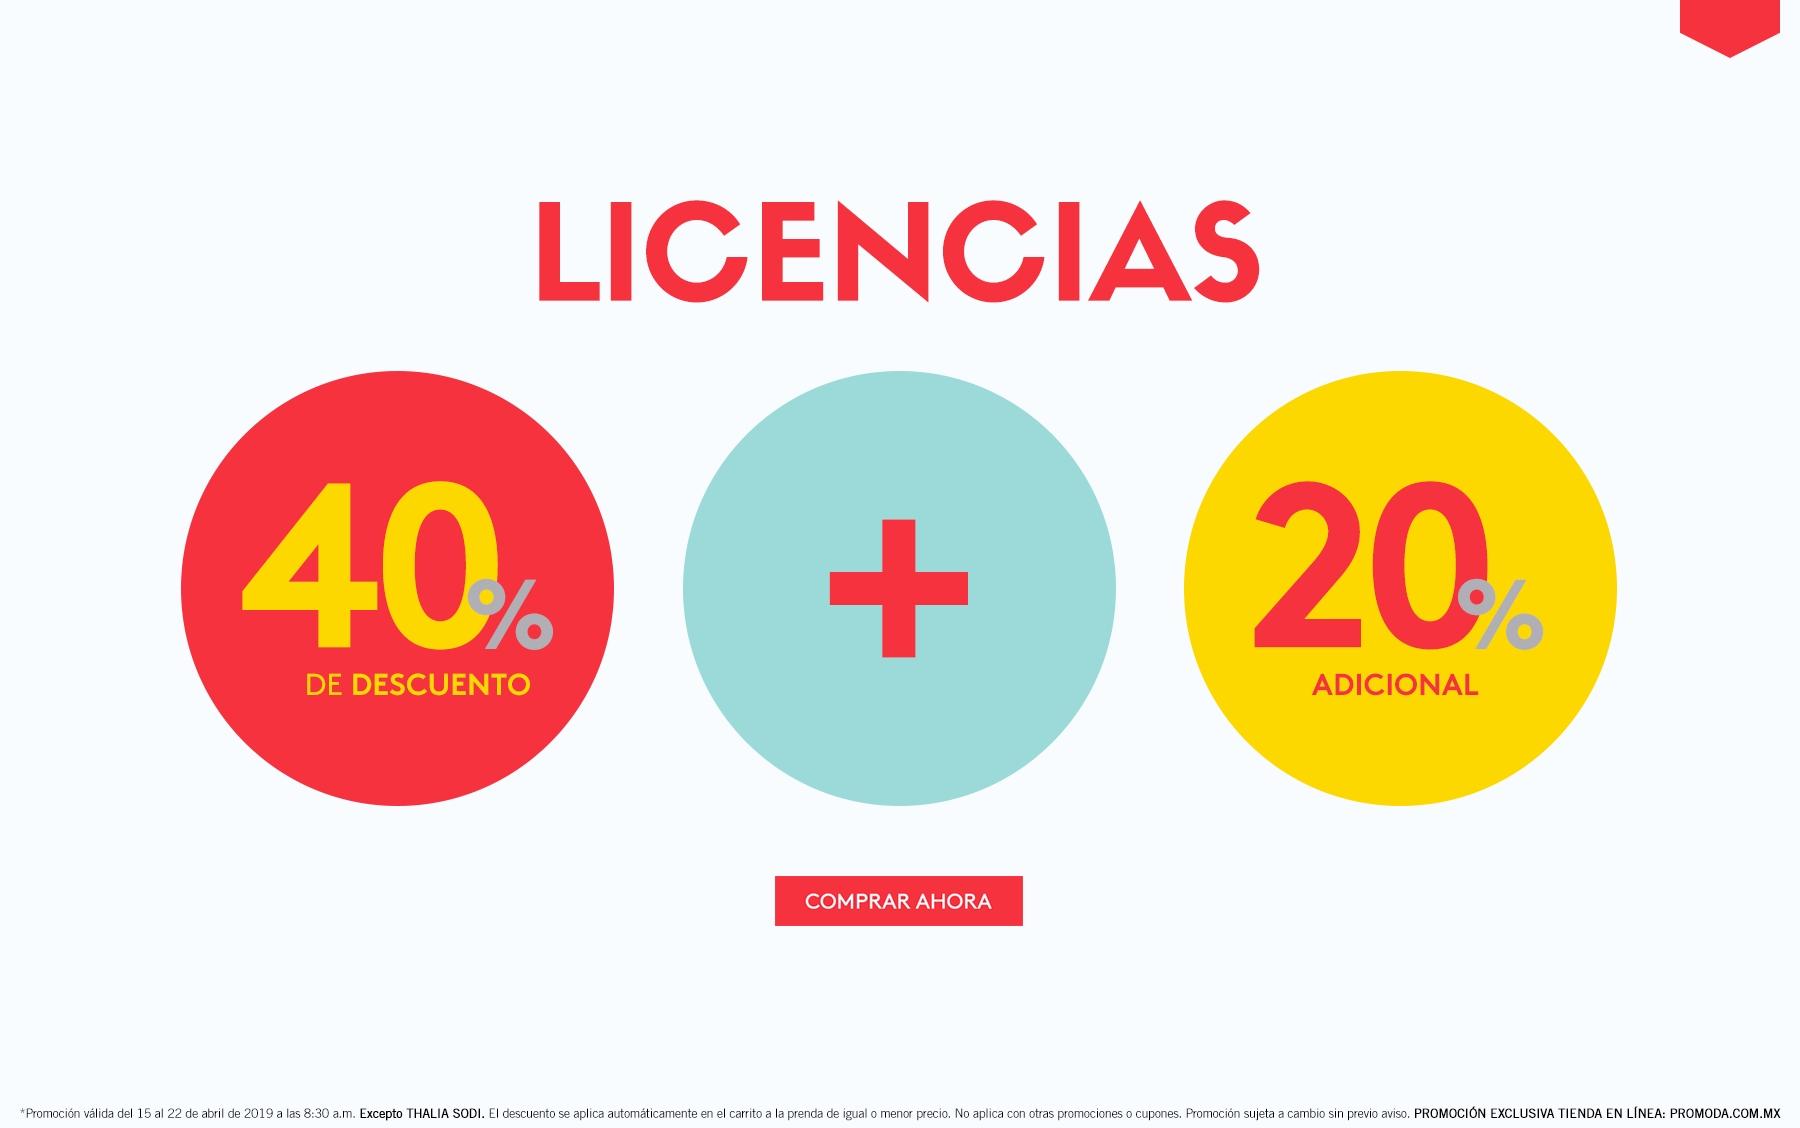 Promoda Outlet: 40% de descuento + 20% adicional en licencias